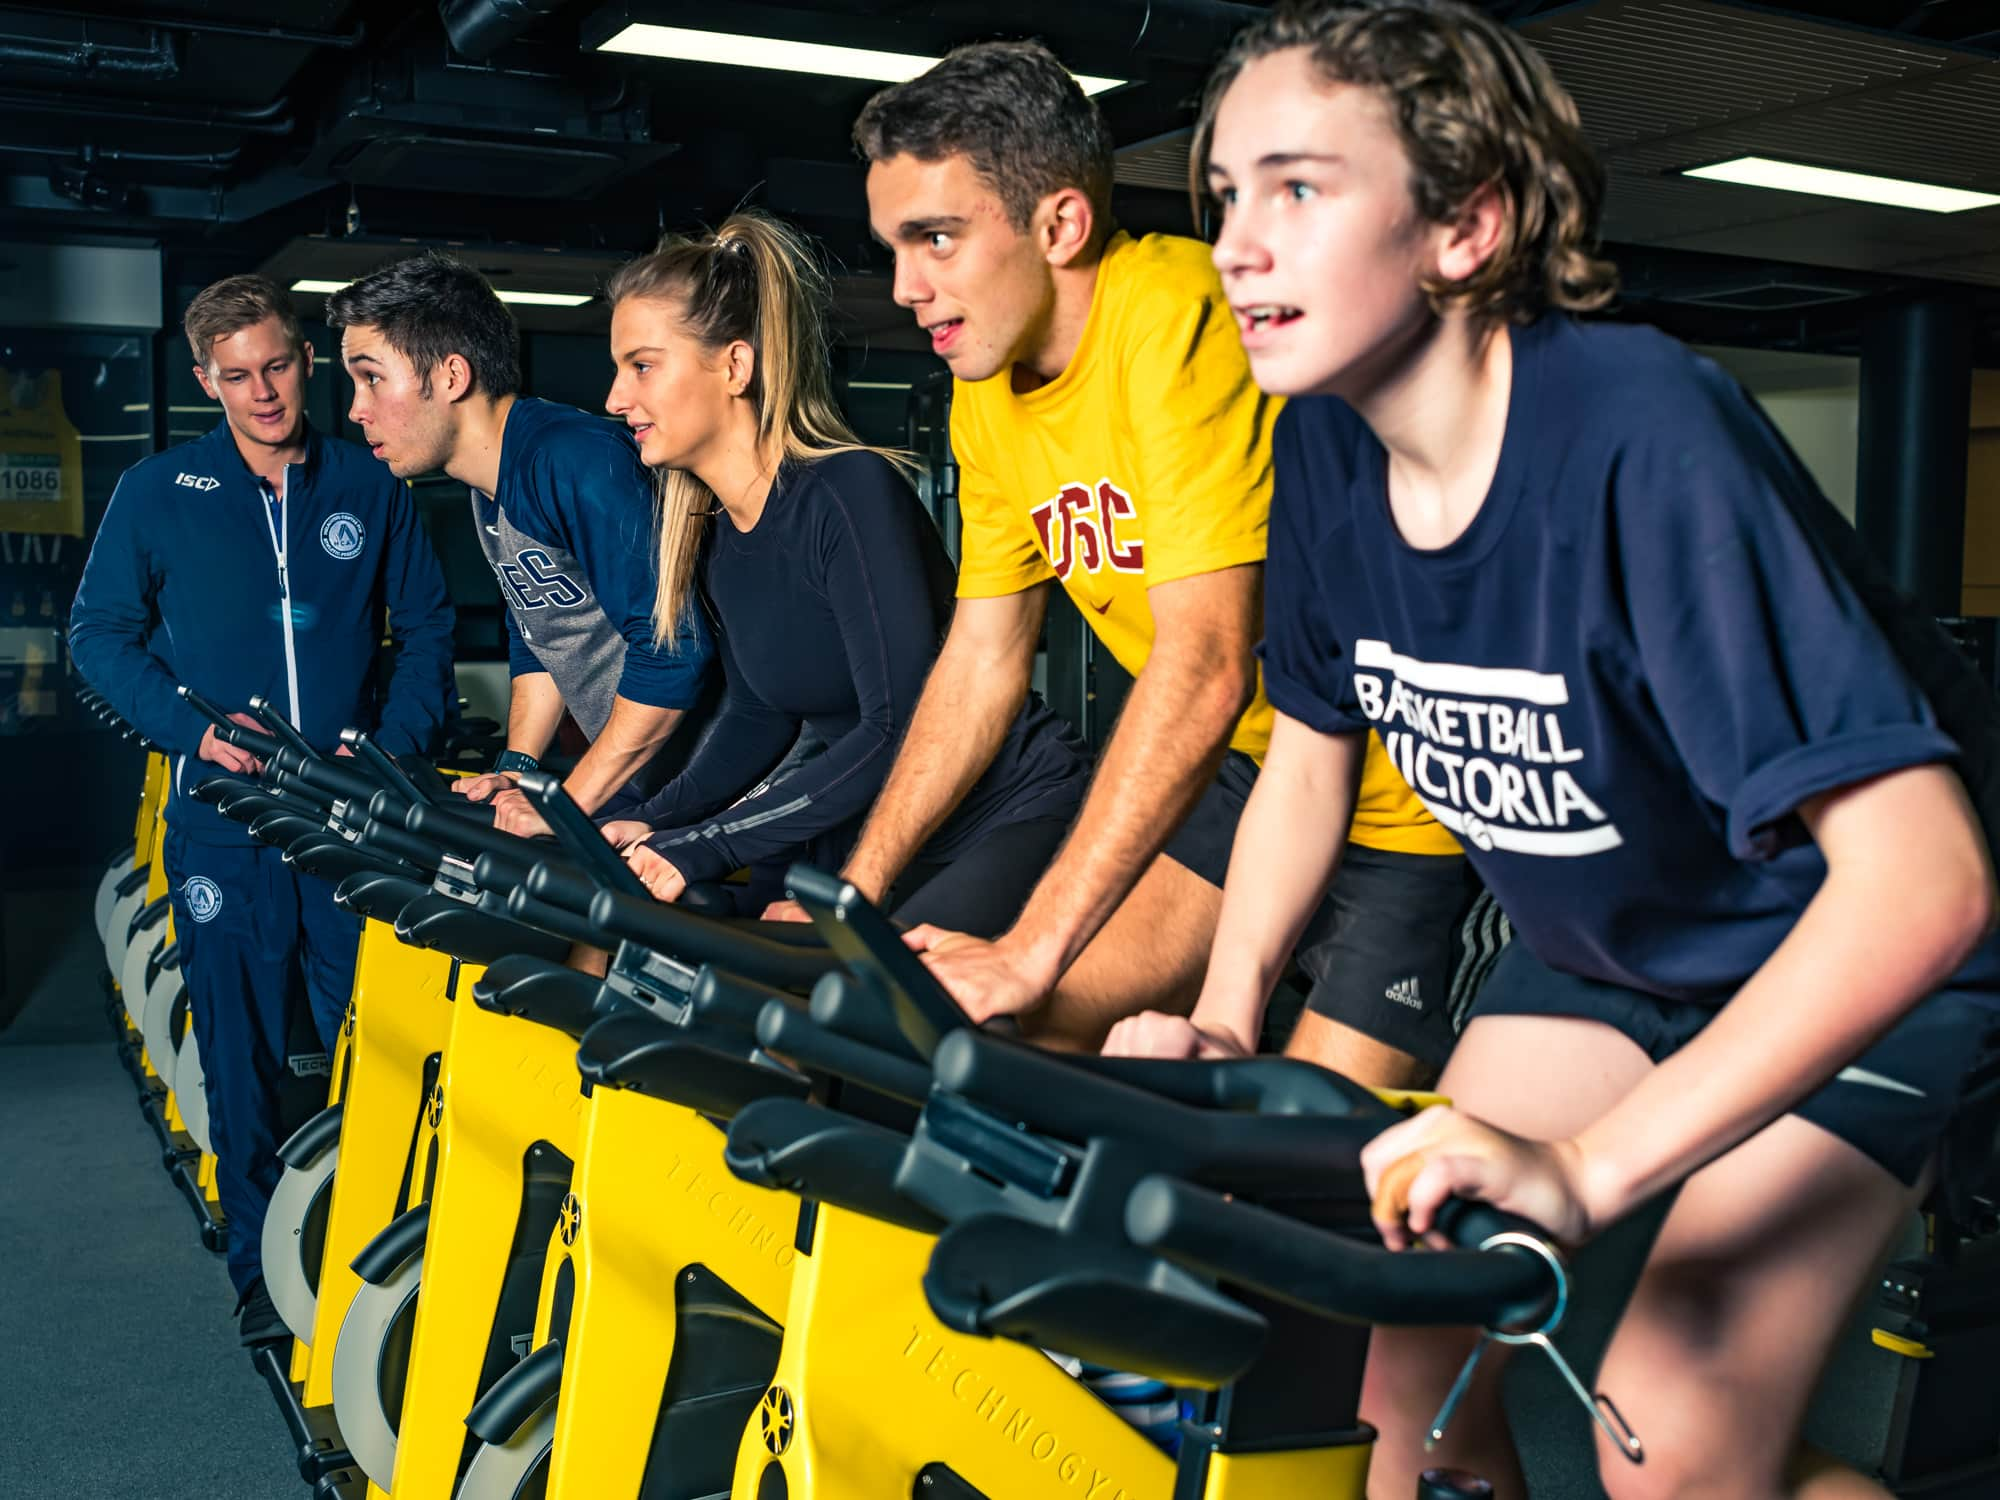 Sports Photography Melbourne Centre Athletic Performance bikes